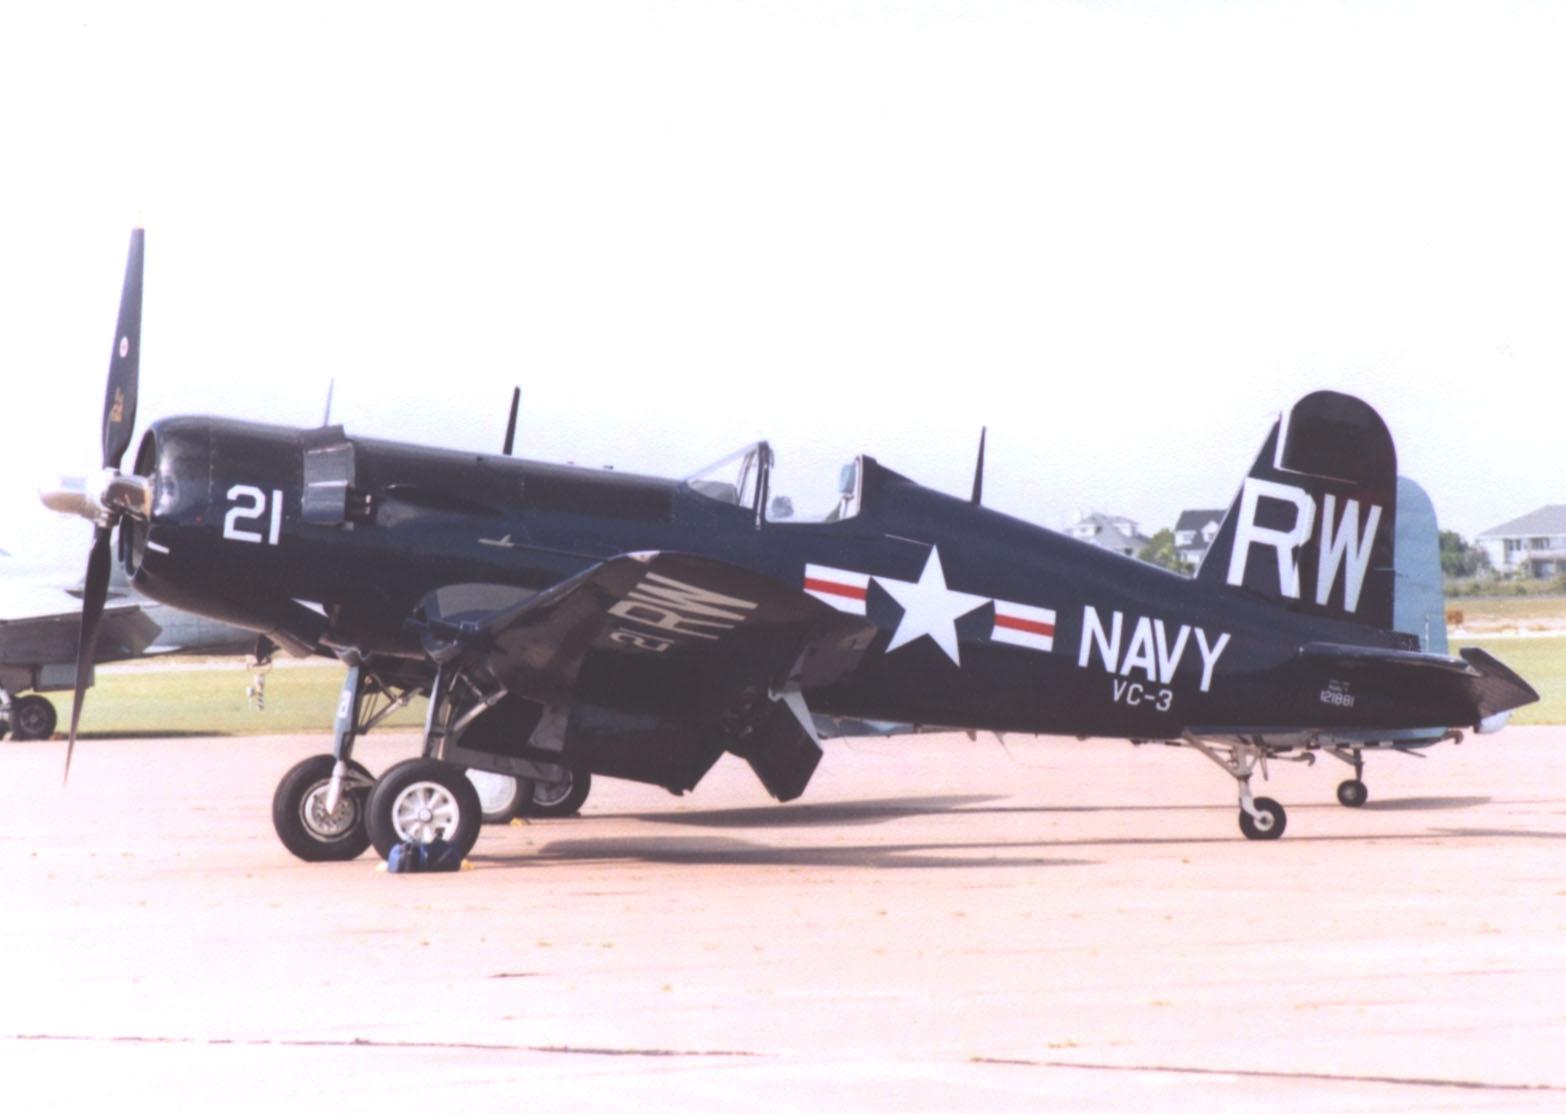 Retirement income: Navy F4U Corsair